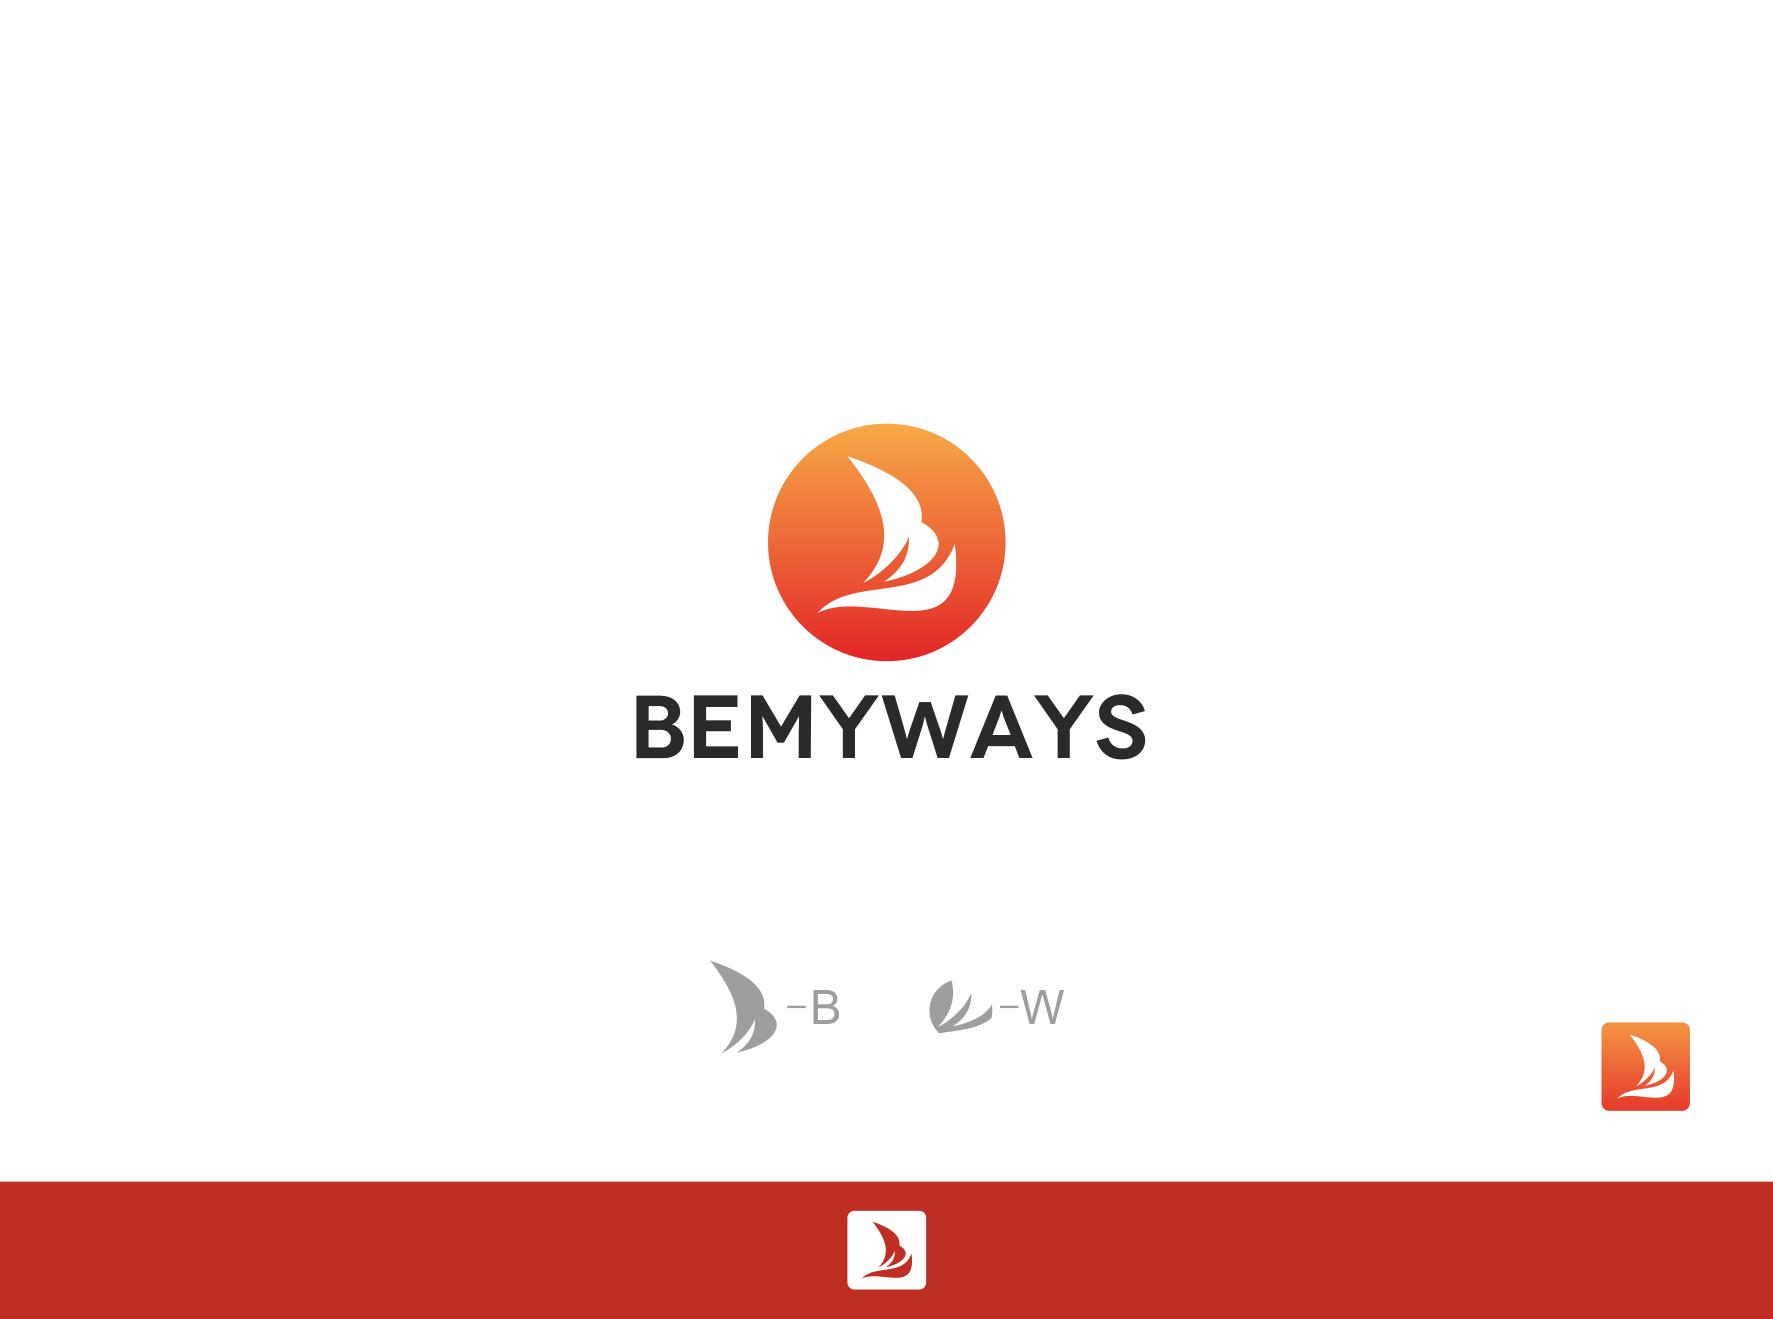 Разработка логотипа и иконки для Travel Video Platform фото f_2385c36c6a23cee2.png